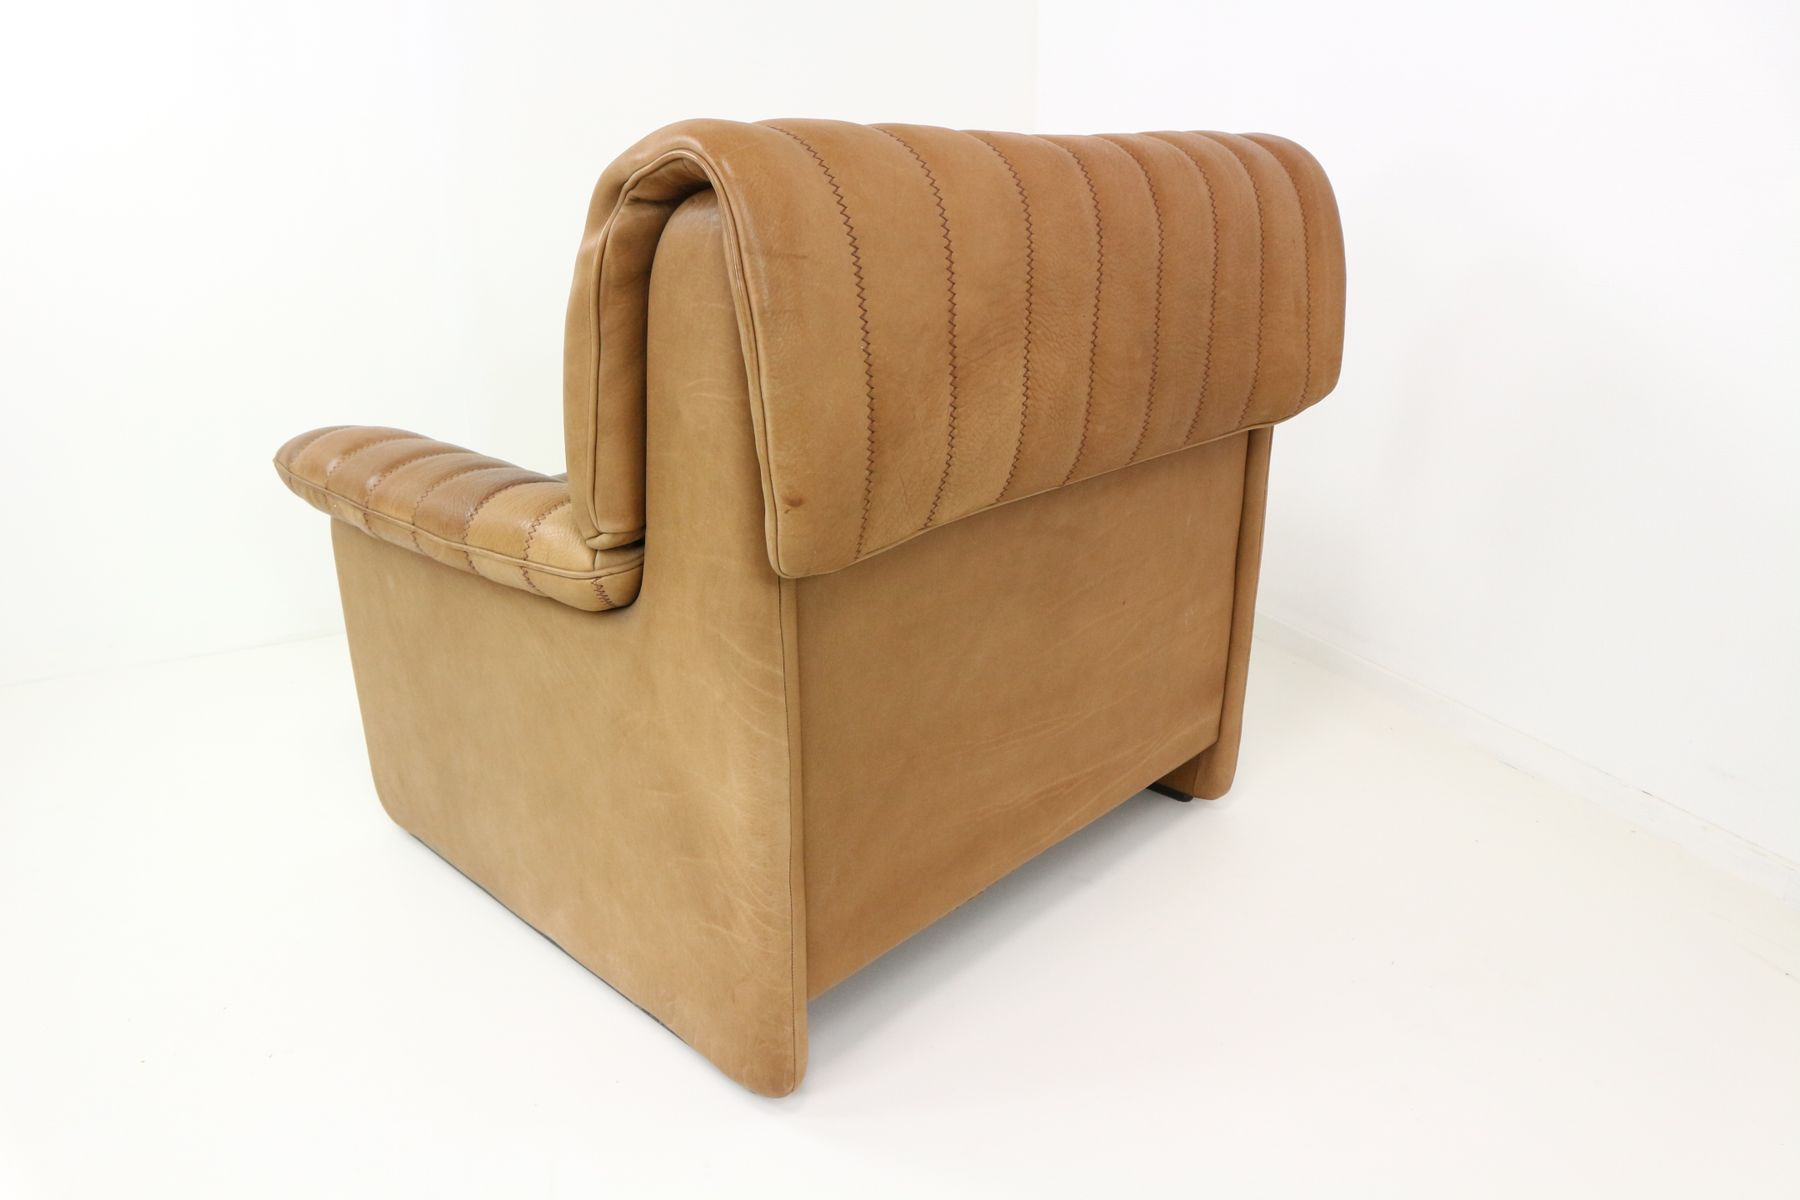 ds 85 sessel von de sede 1970er bei pamono kaufen. Black Bedroom Furniture Sets. Home Design Ideas